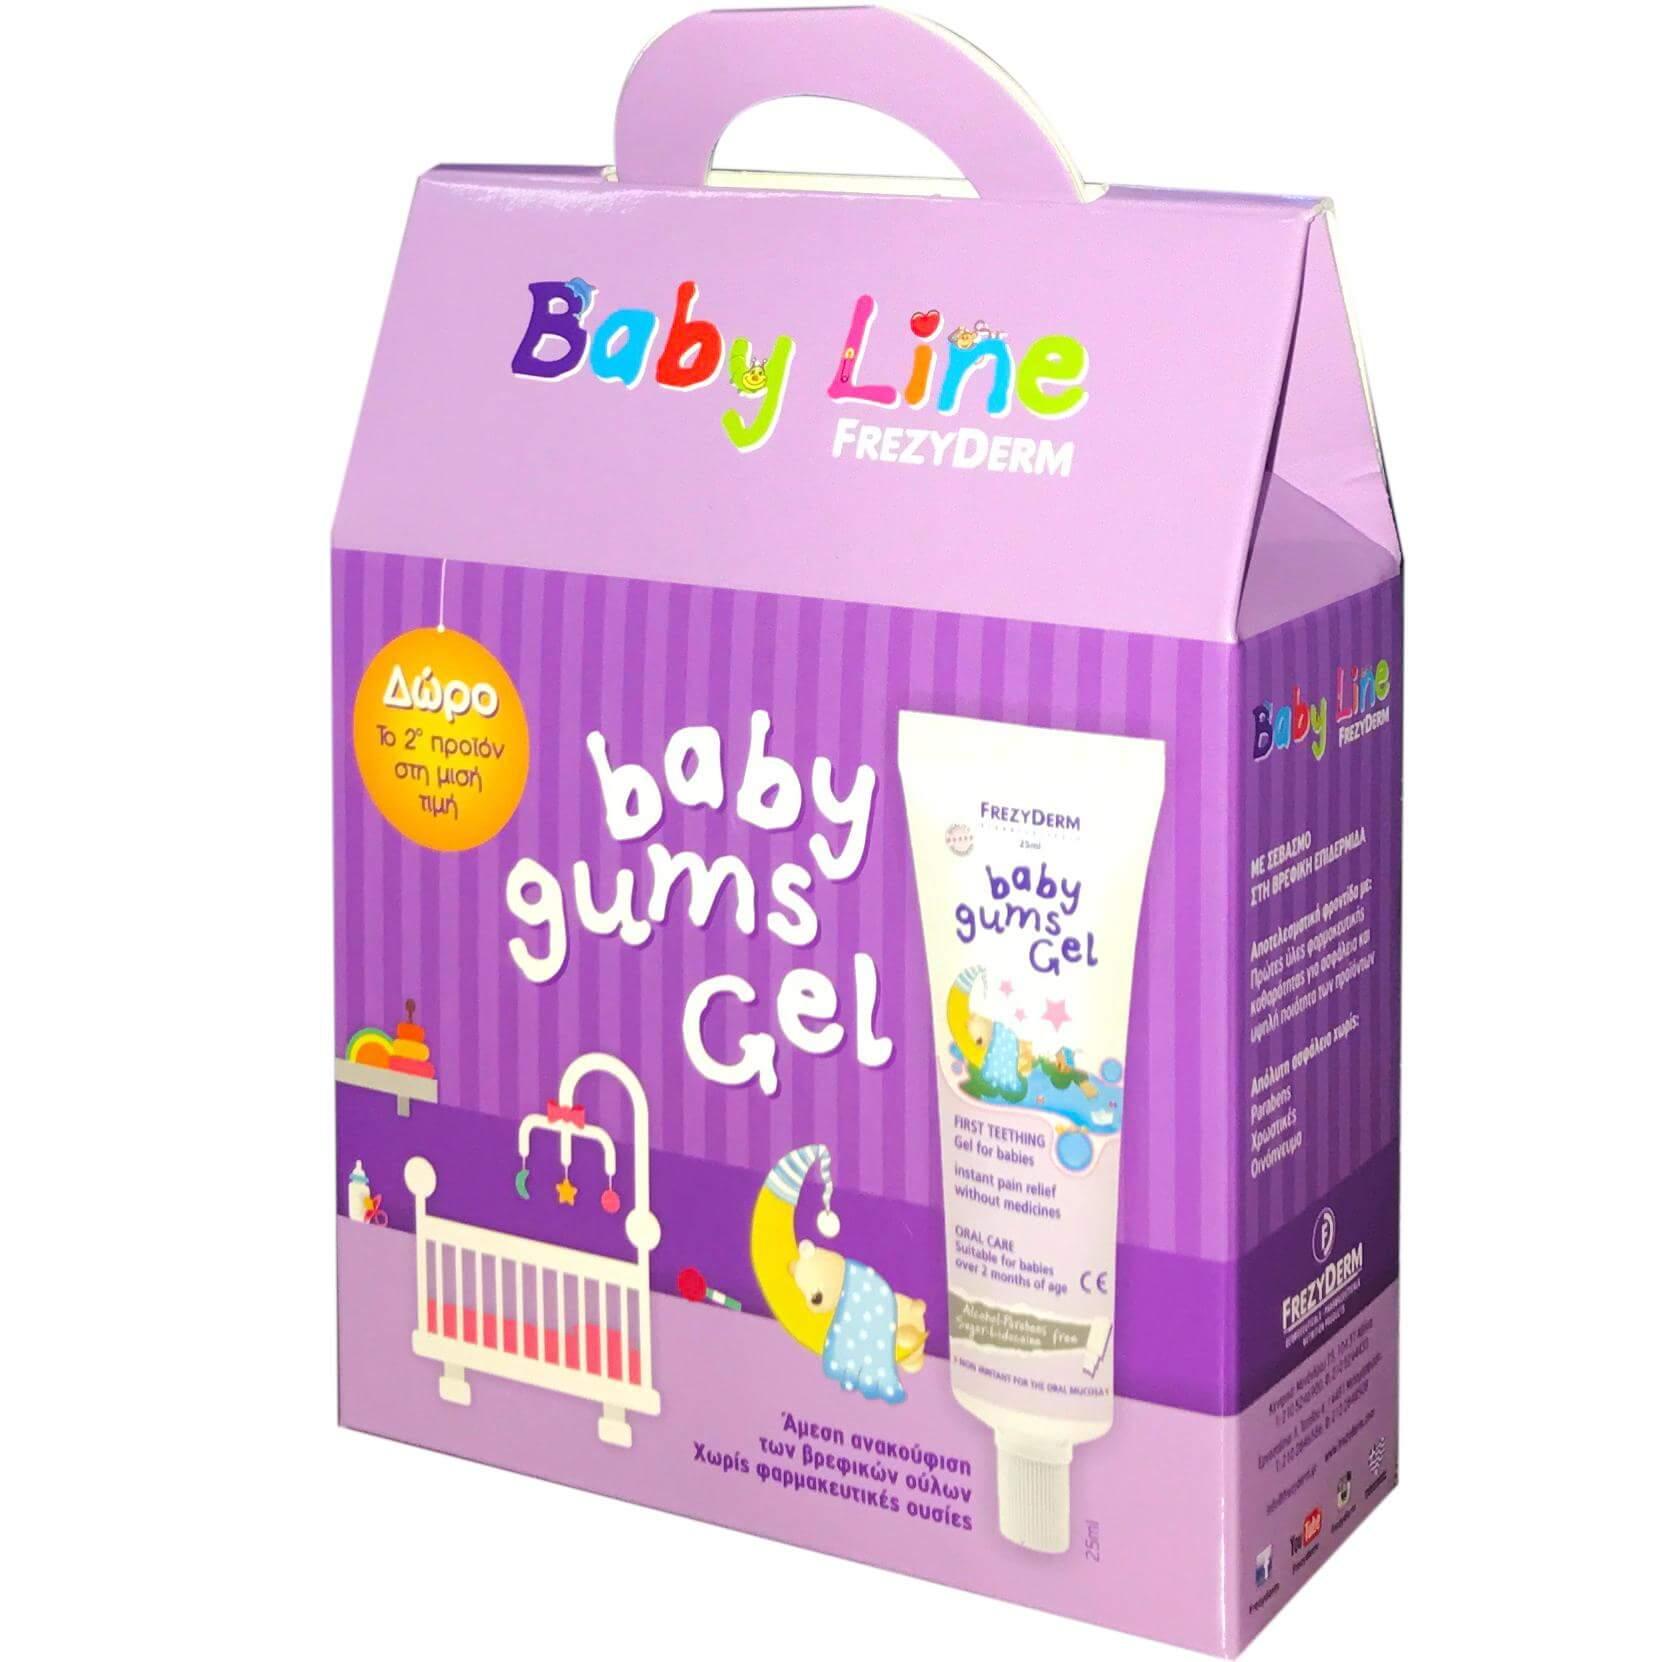 Frezyderm Πακέτο Προσφοράς Baby Gums Gel για Άμεση Ανακούφιση των ΒρεφικώνΟύλων& Δώρο το 2°Προϊόν στη Μισή Τιμή 2x25ml